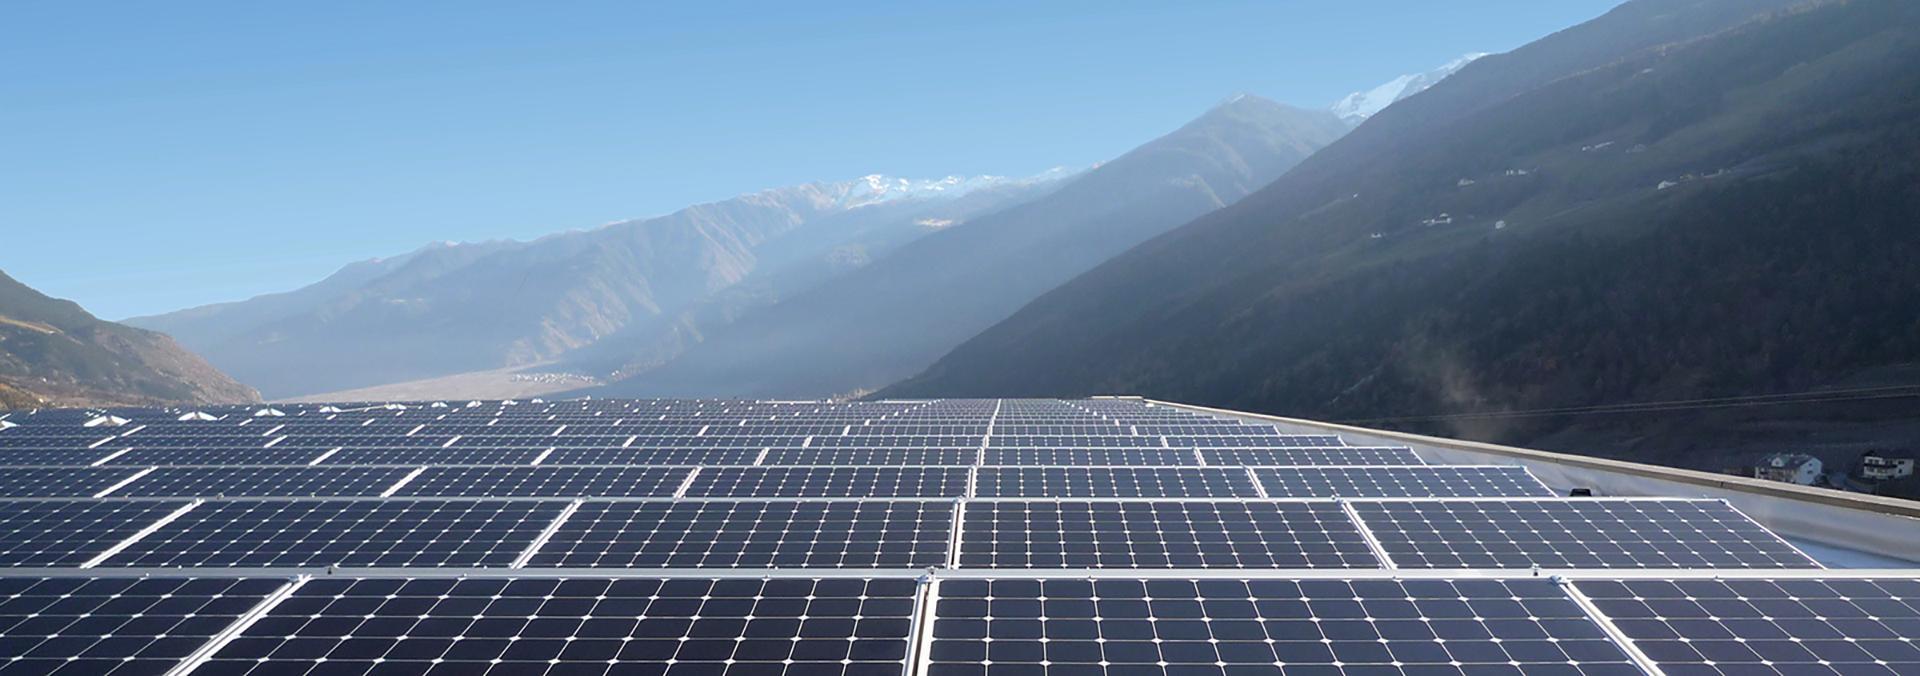 au-homepage-solar-mountains-1920px.jpeg